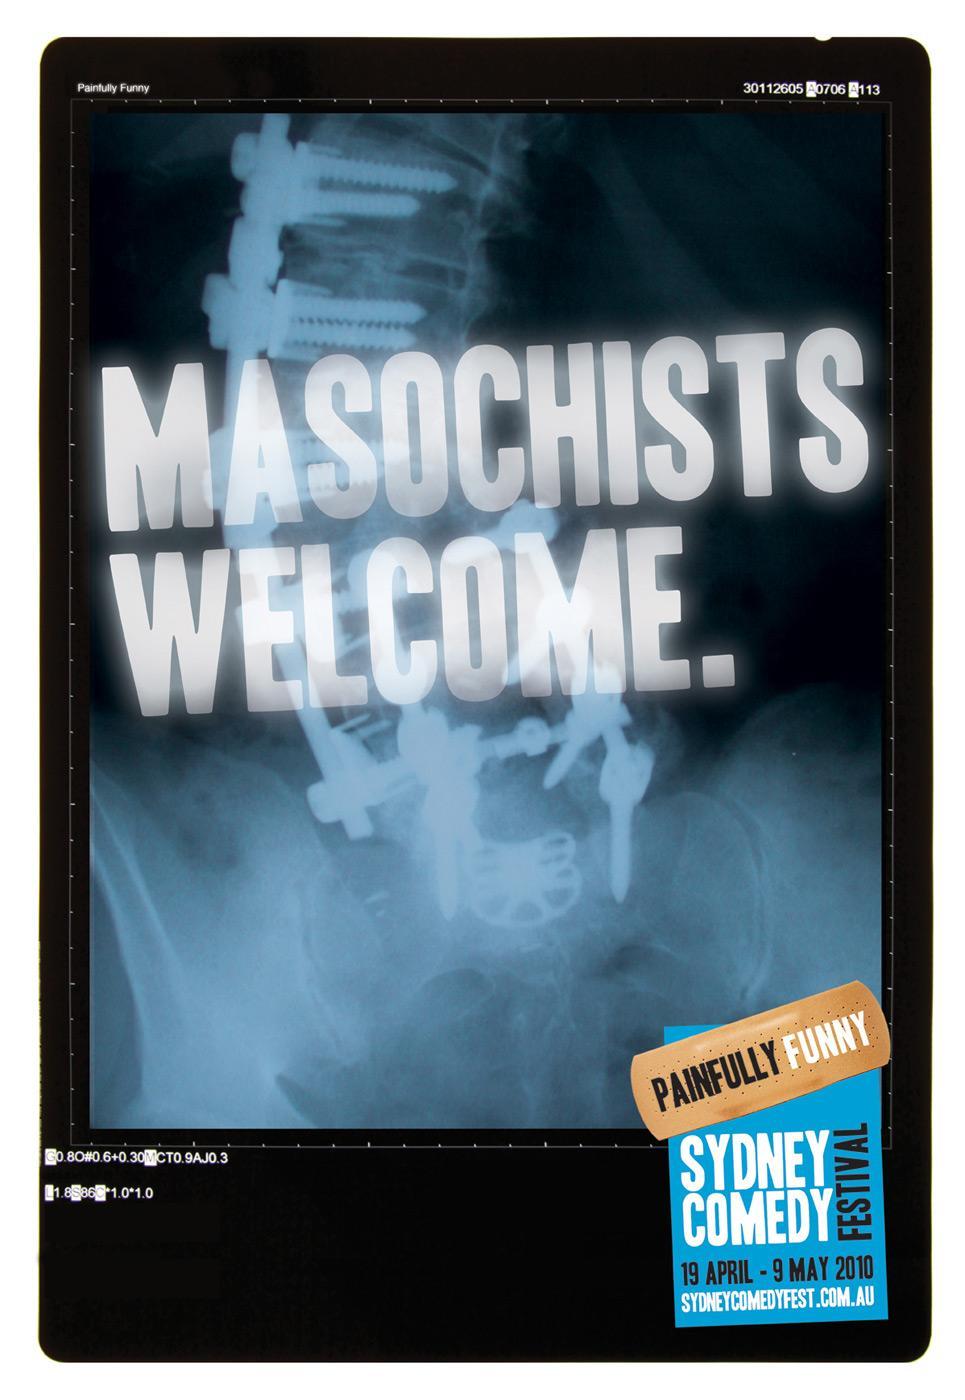 Sydney Comedy Festival Print Ad -  Masochists